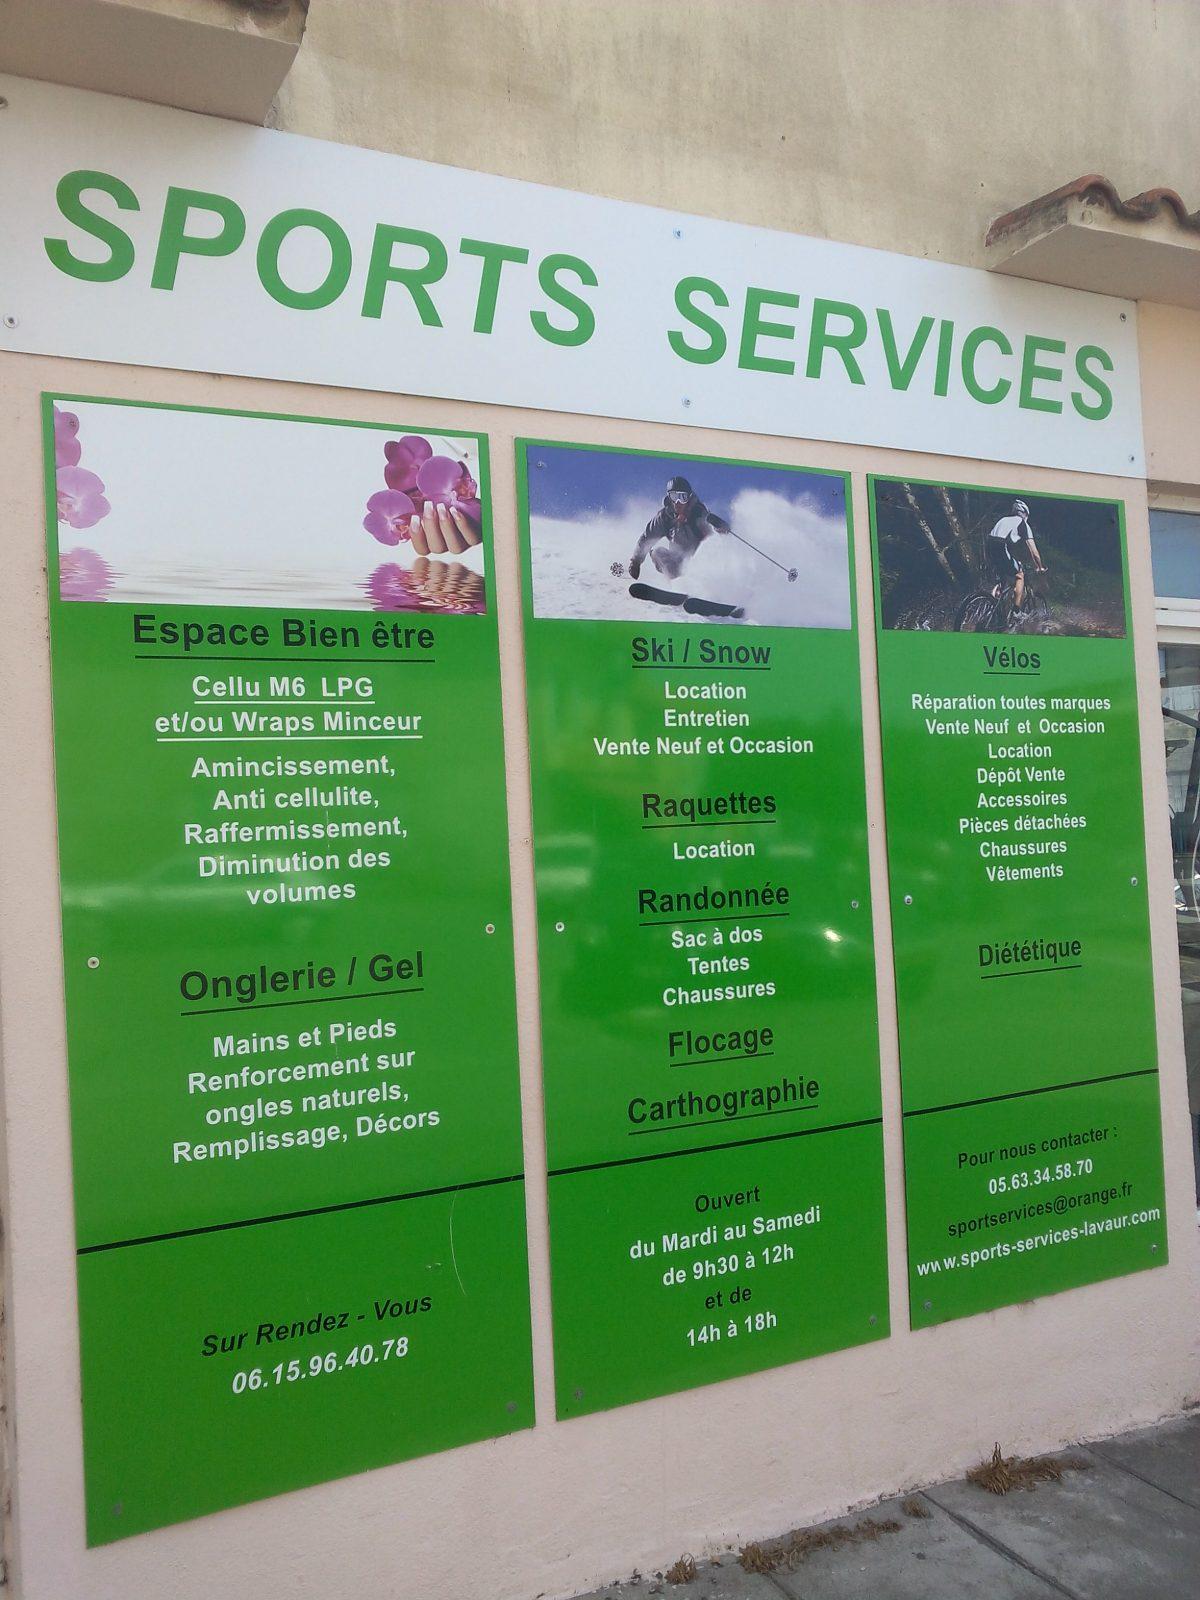 Sports Services – Lavaur – Tarn